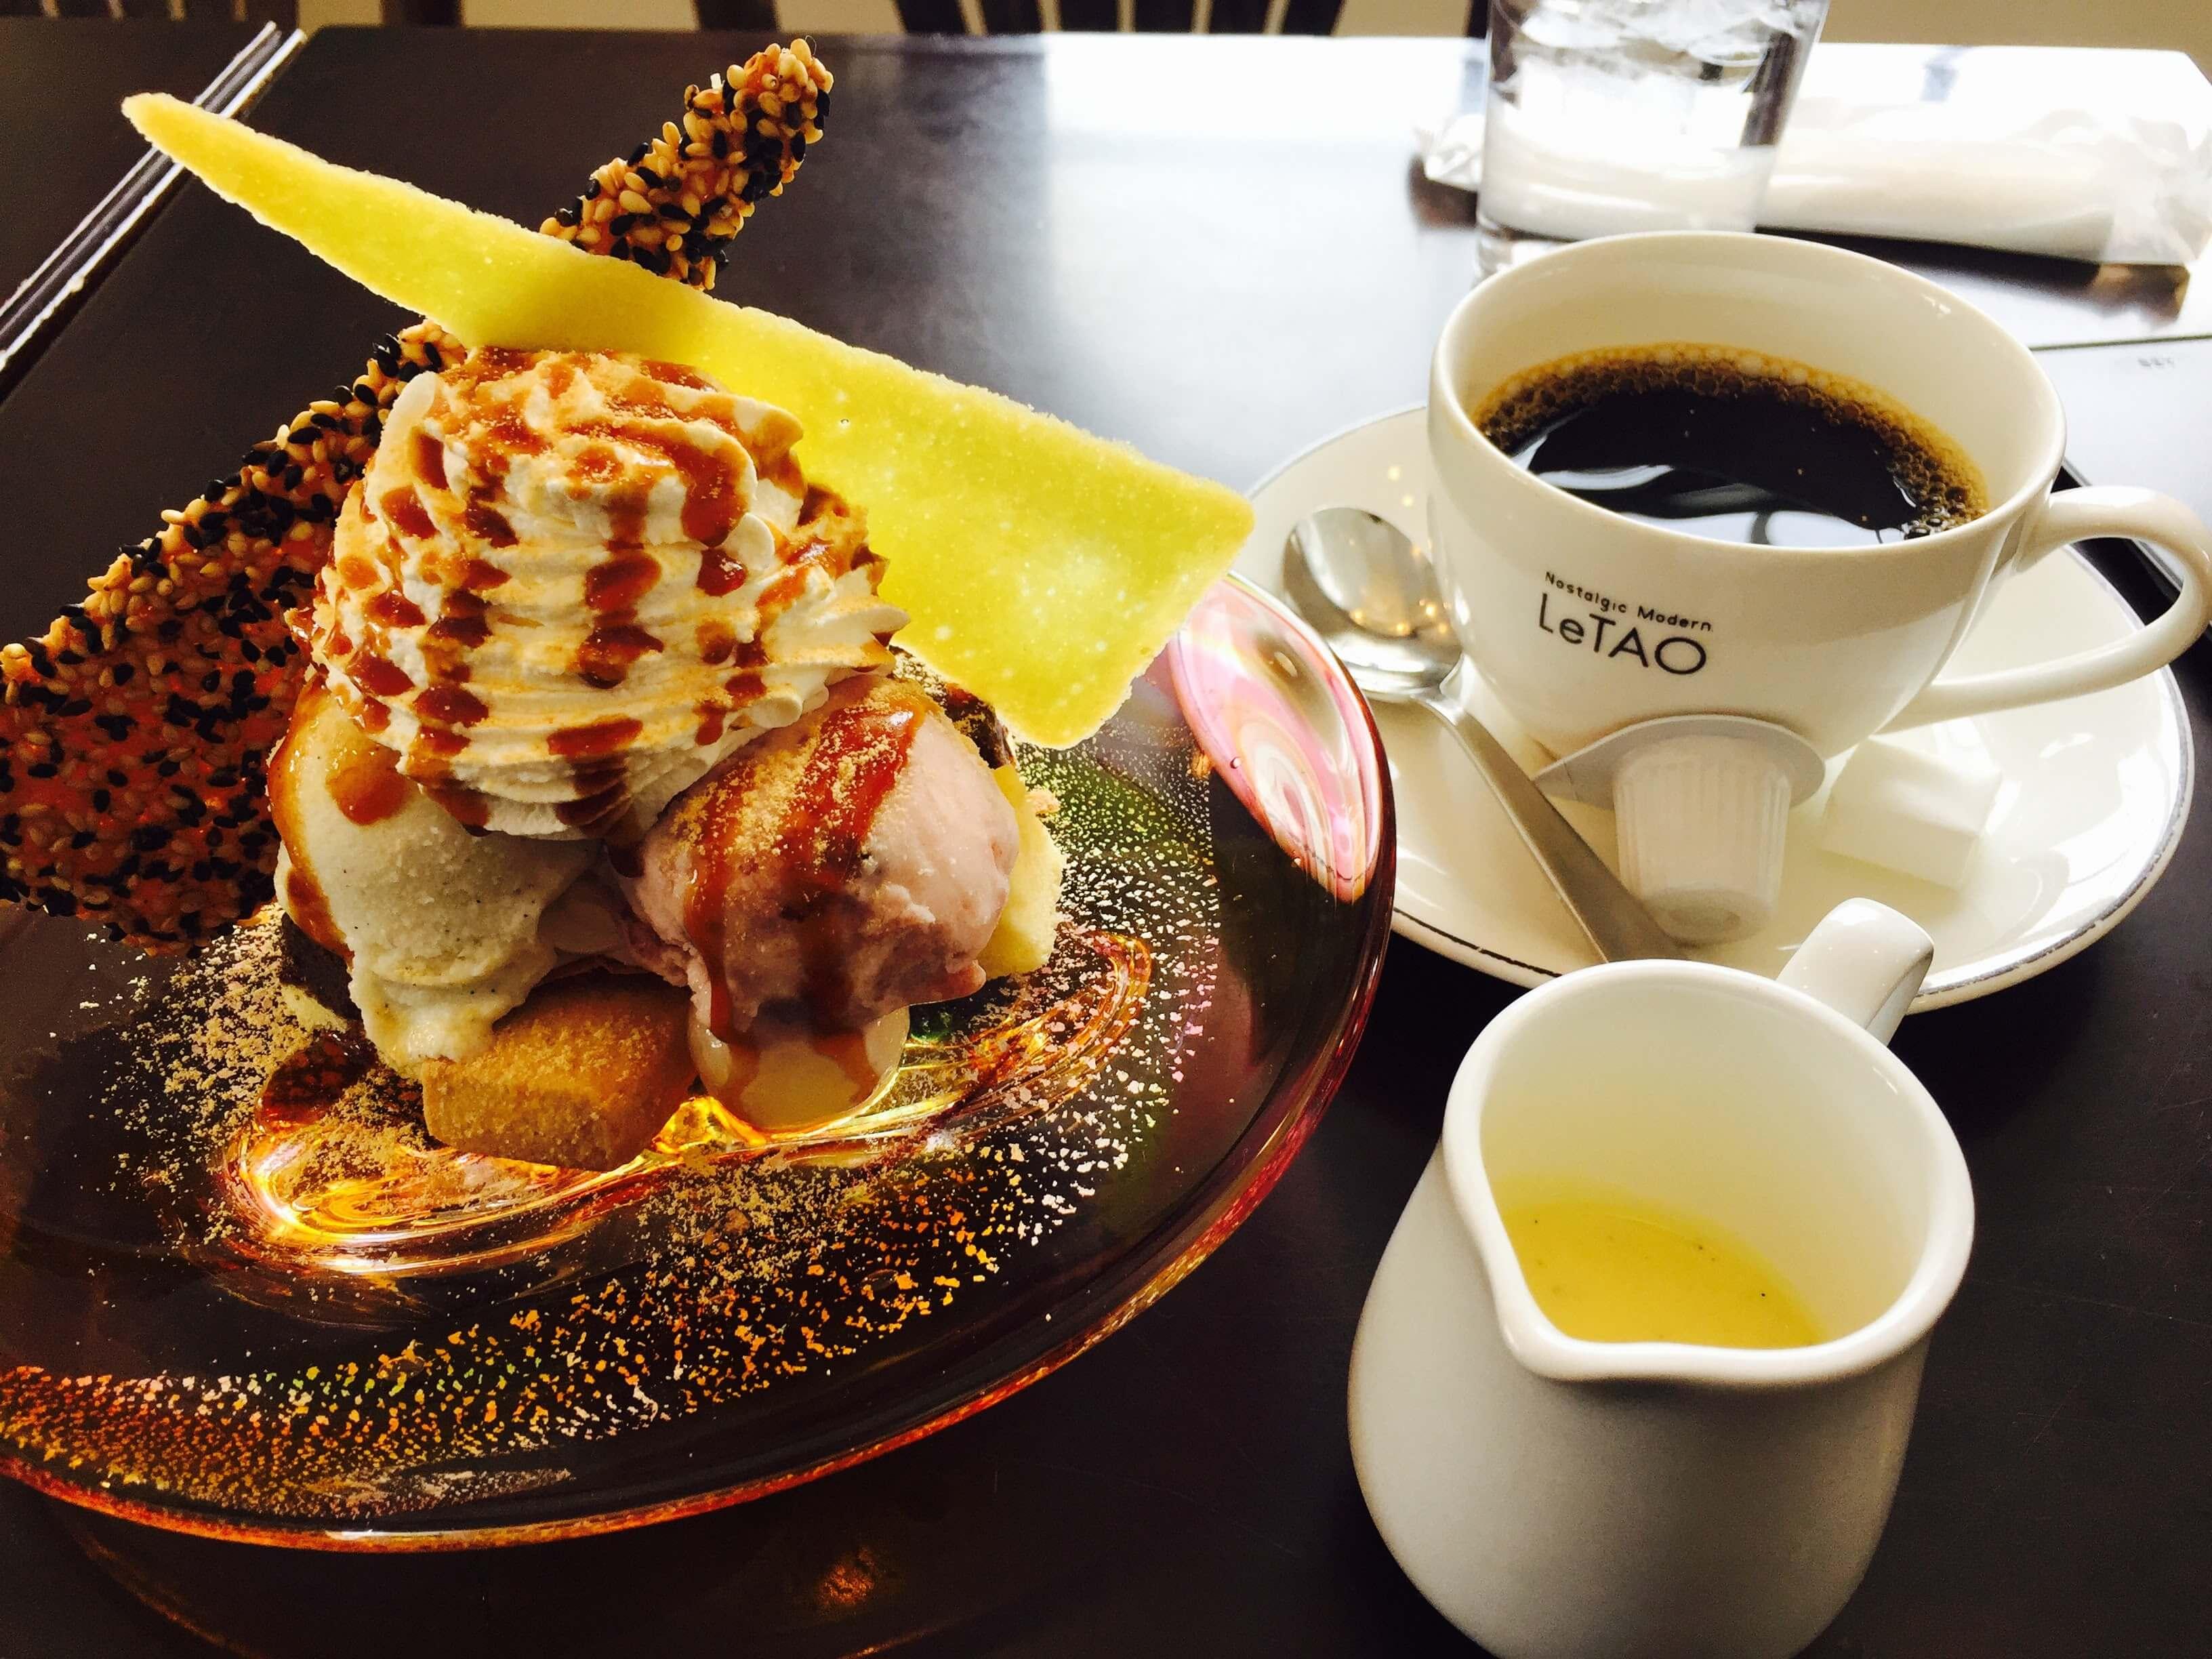 LeTAO 冰 淇 淋 套 餐, 但 還 是 比 較 推 薦 吃 這 裡 的 起 司 蛋 糕 !